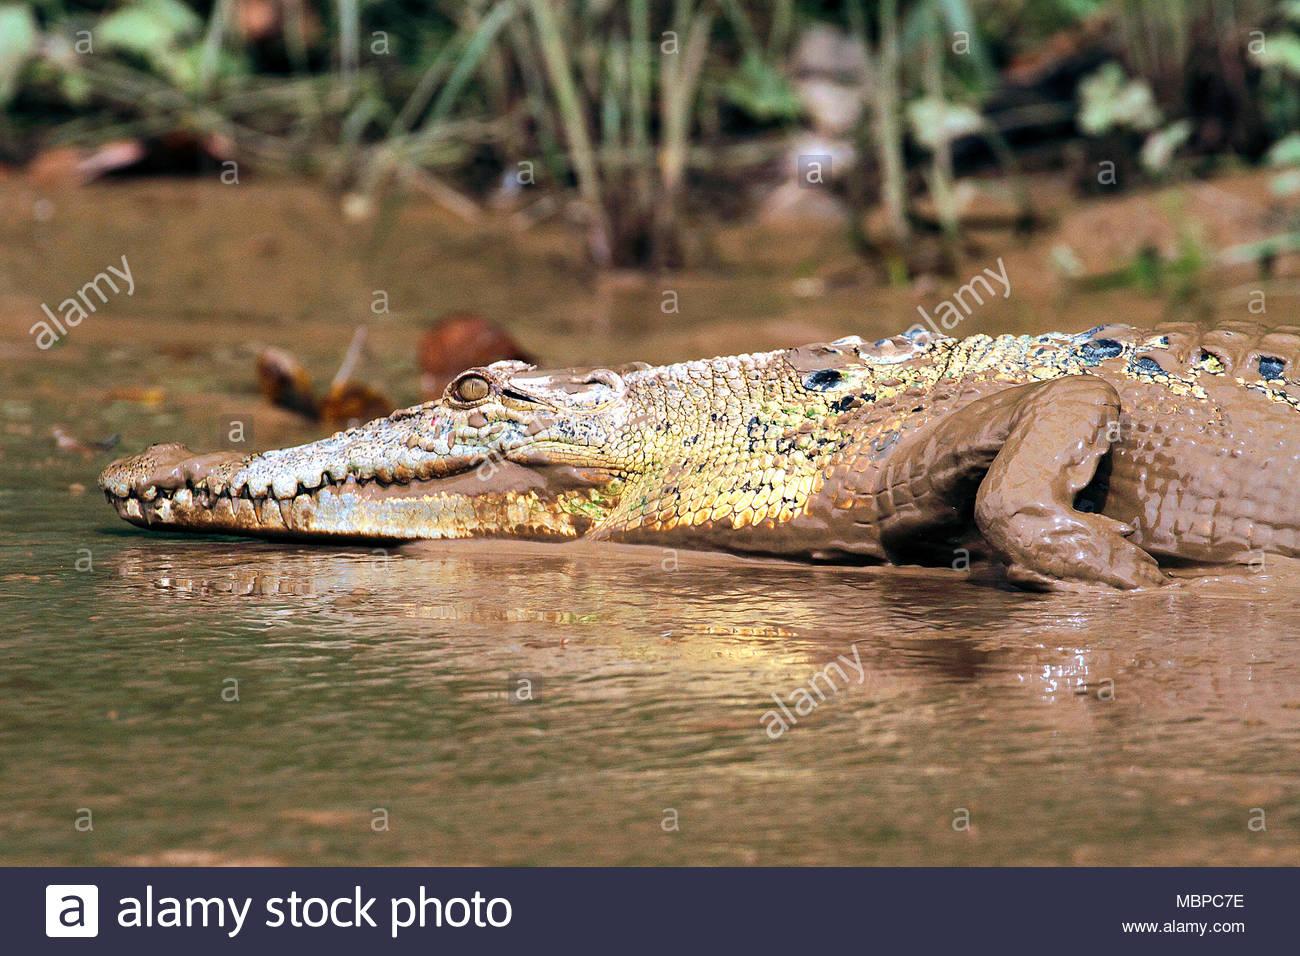 Saltwater Crocodile (Crocodylus porosus), Borneo, Malaysia - Stock Image